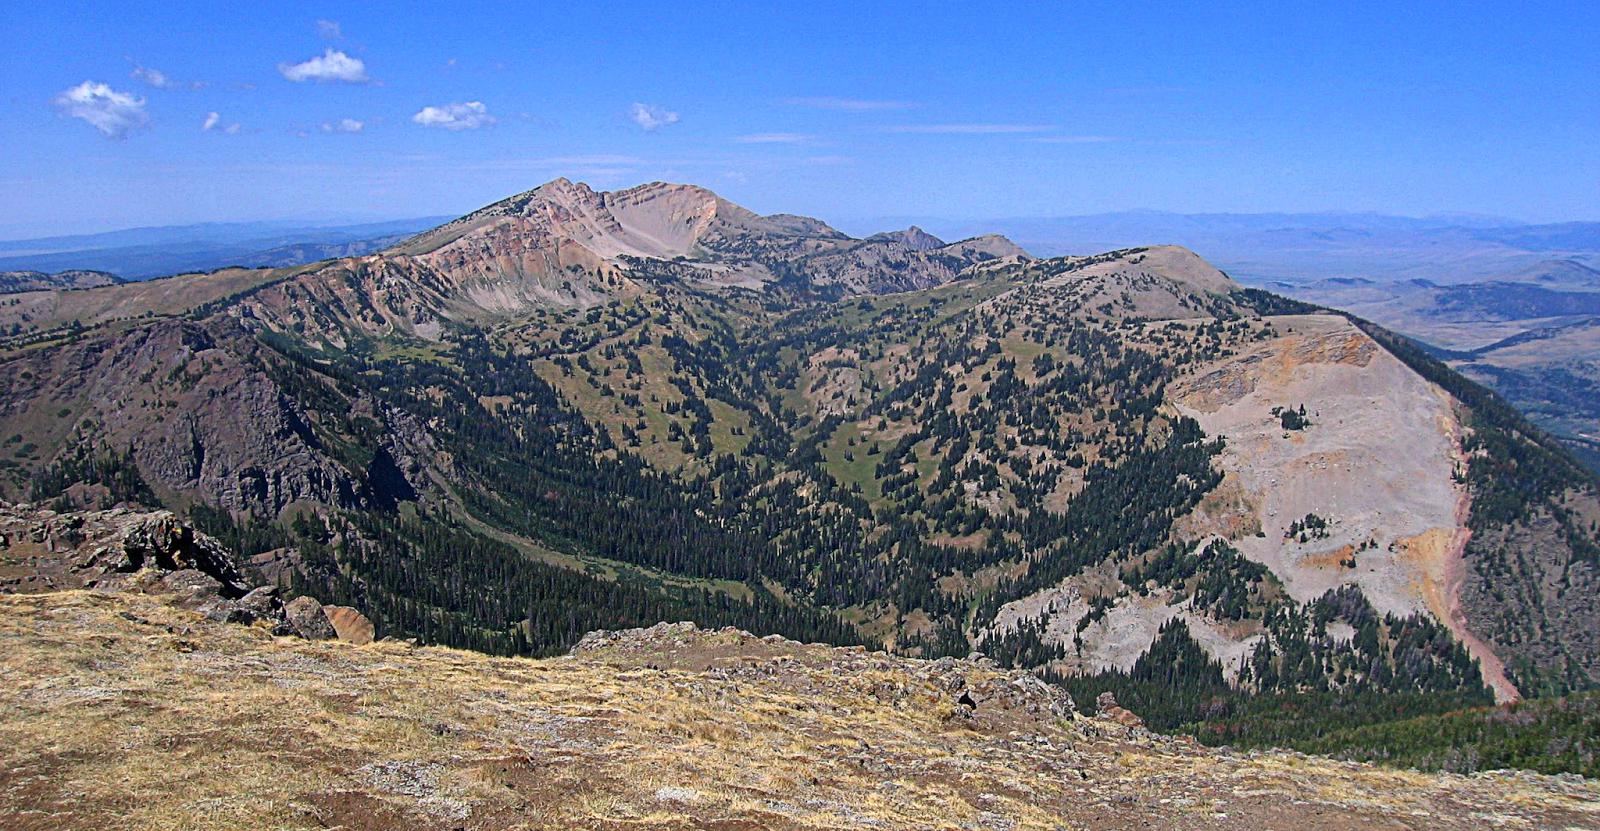 Centennial Range, Idaho and Montana from Sawtelle Peak, Island Park, Idaho by RocDocTravel.com